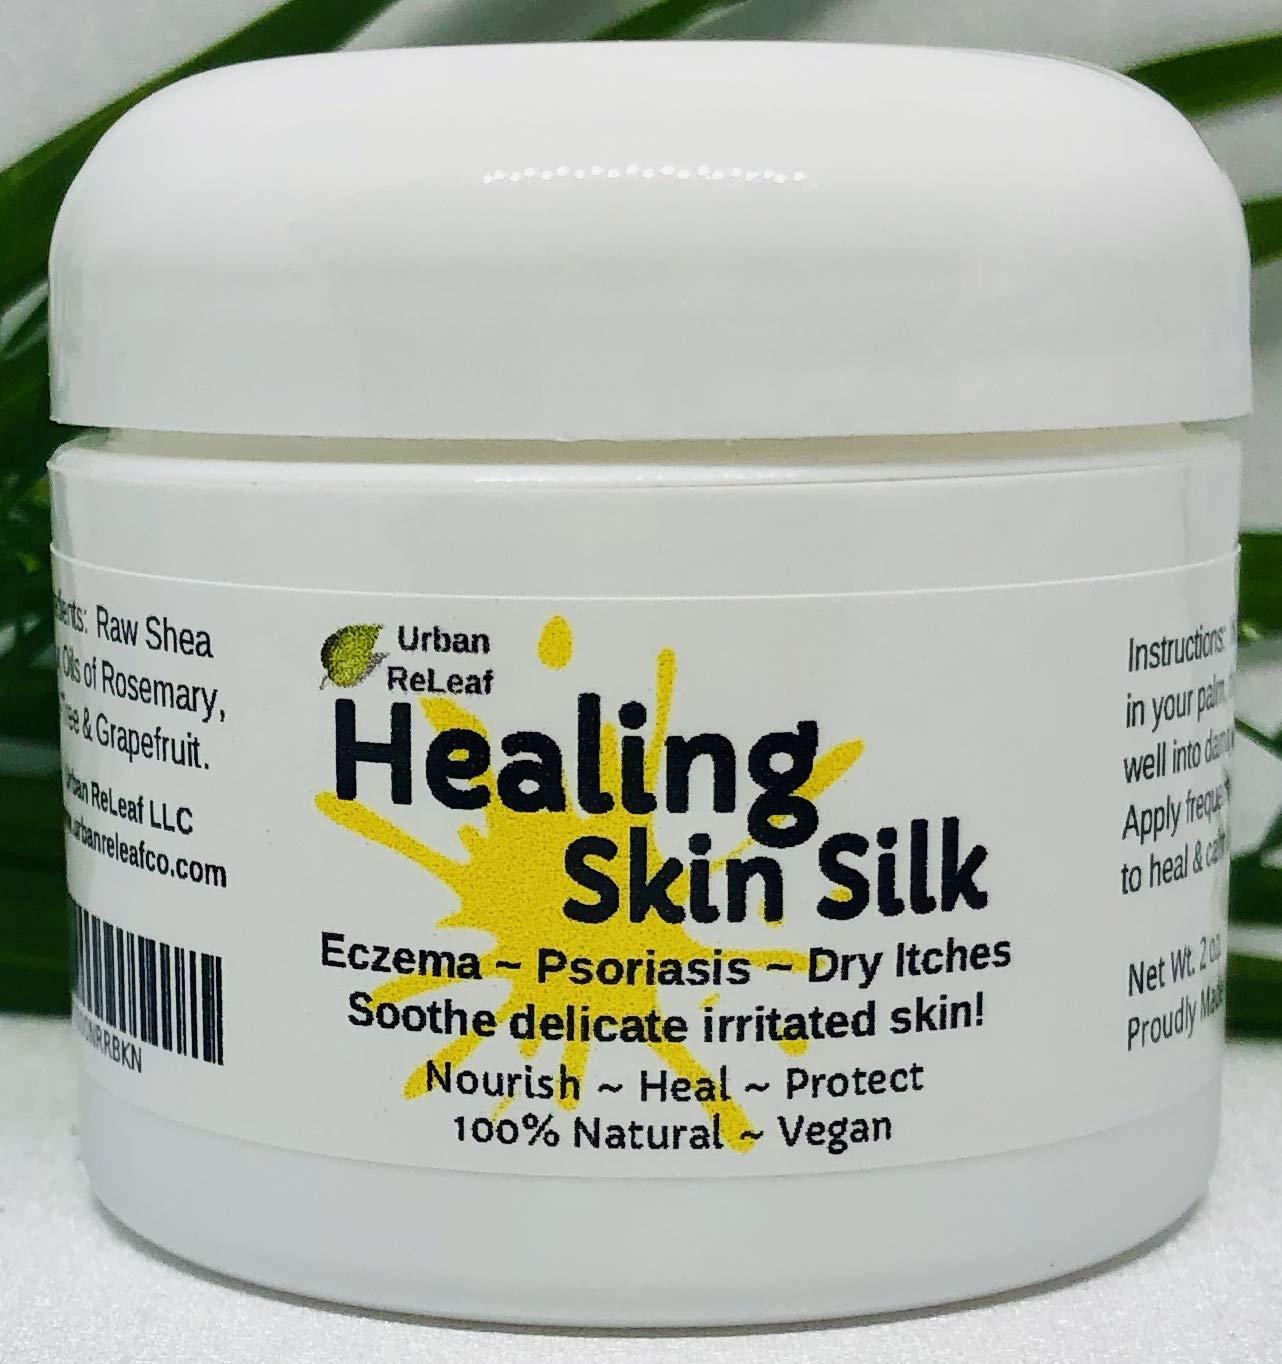 Urban ReLeaf HEALING SKIN SILK NEW before selling Dry Itch Eczema Psoriasis Heals 4 years warranty